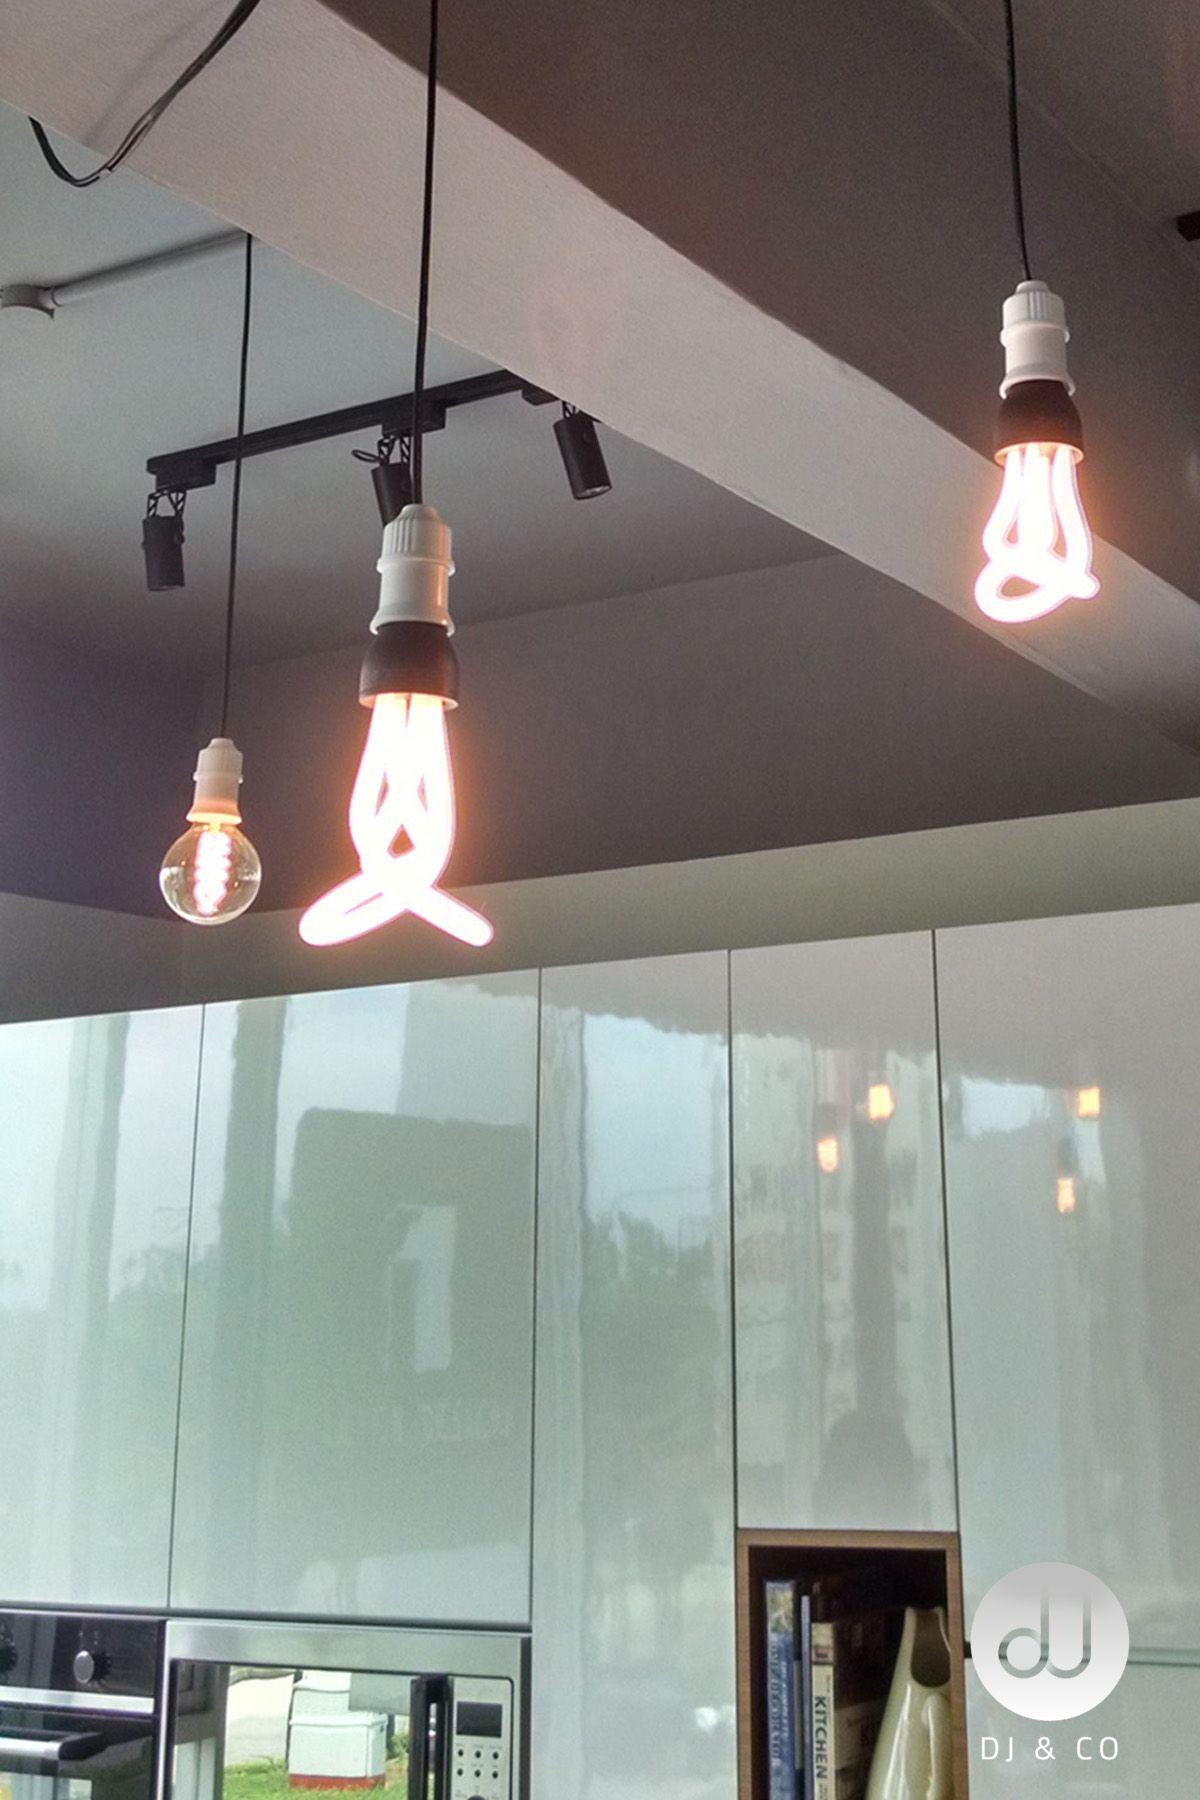 11 Interior Design At Johor Plumen By Dj Co Malaysia Www Djco My Www Fb Com Plumen Djco Plumen Ceiling Lights Design